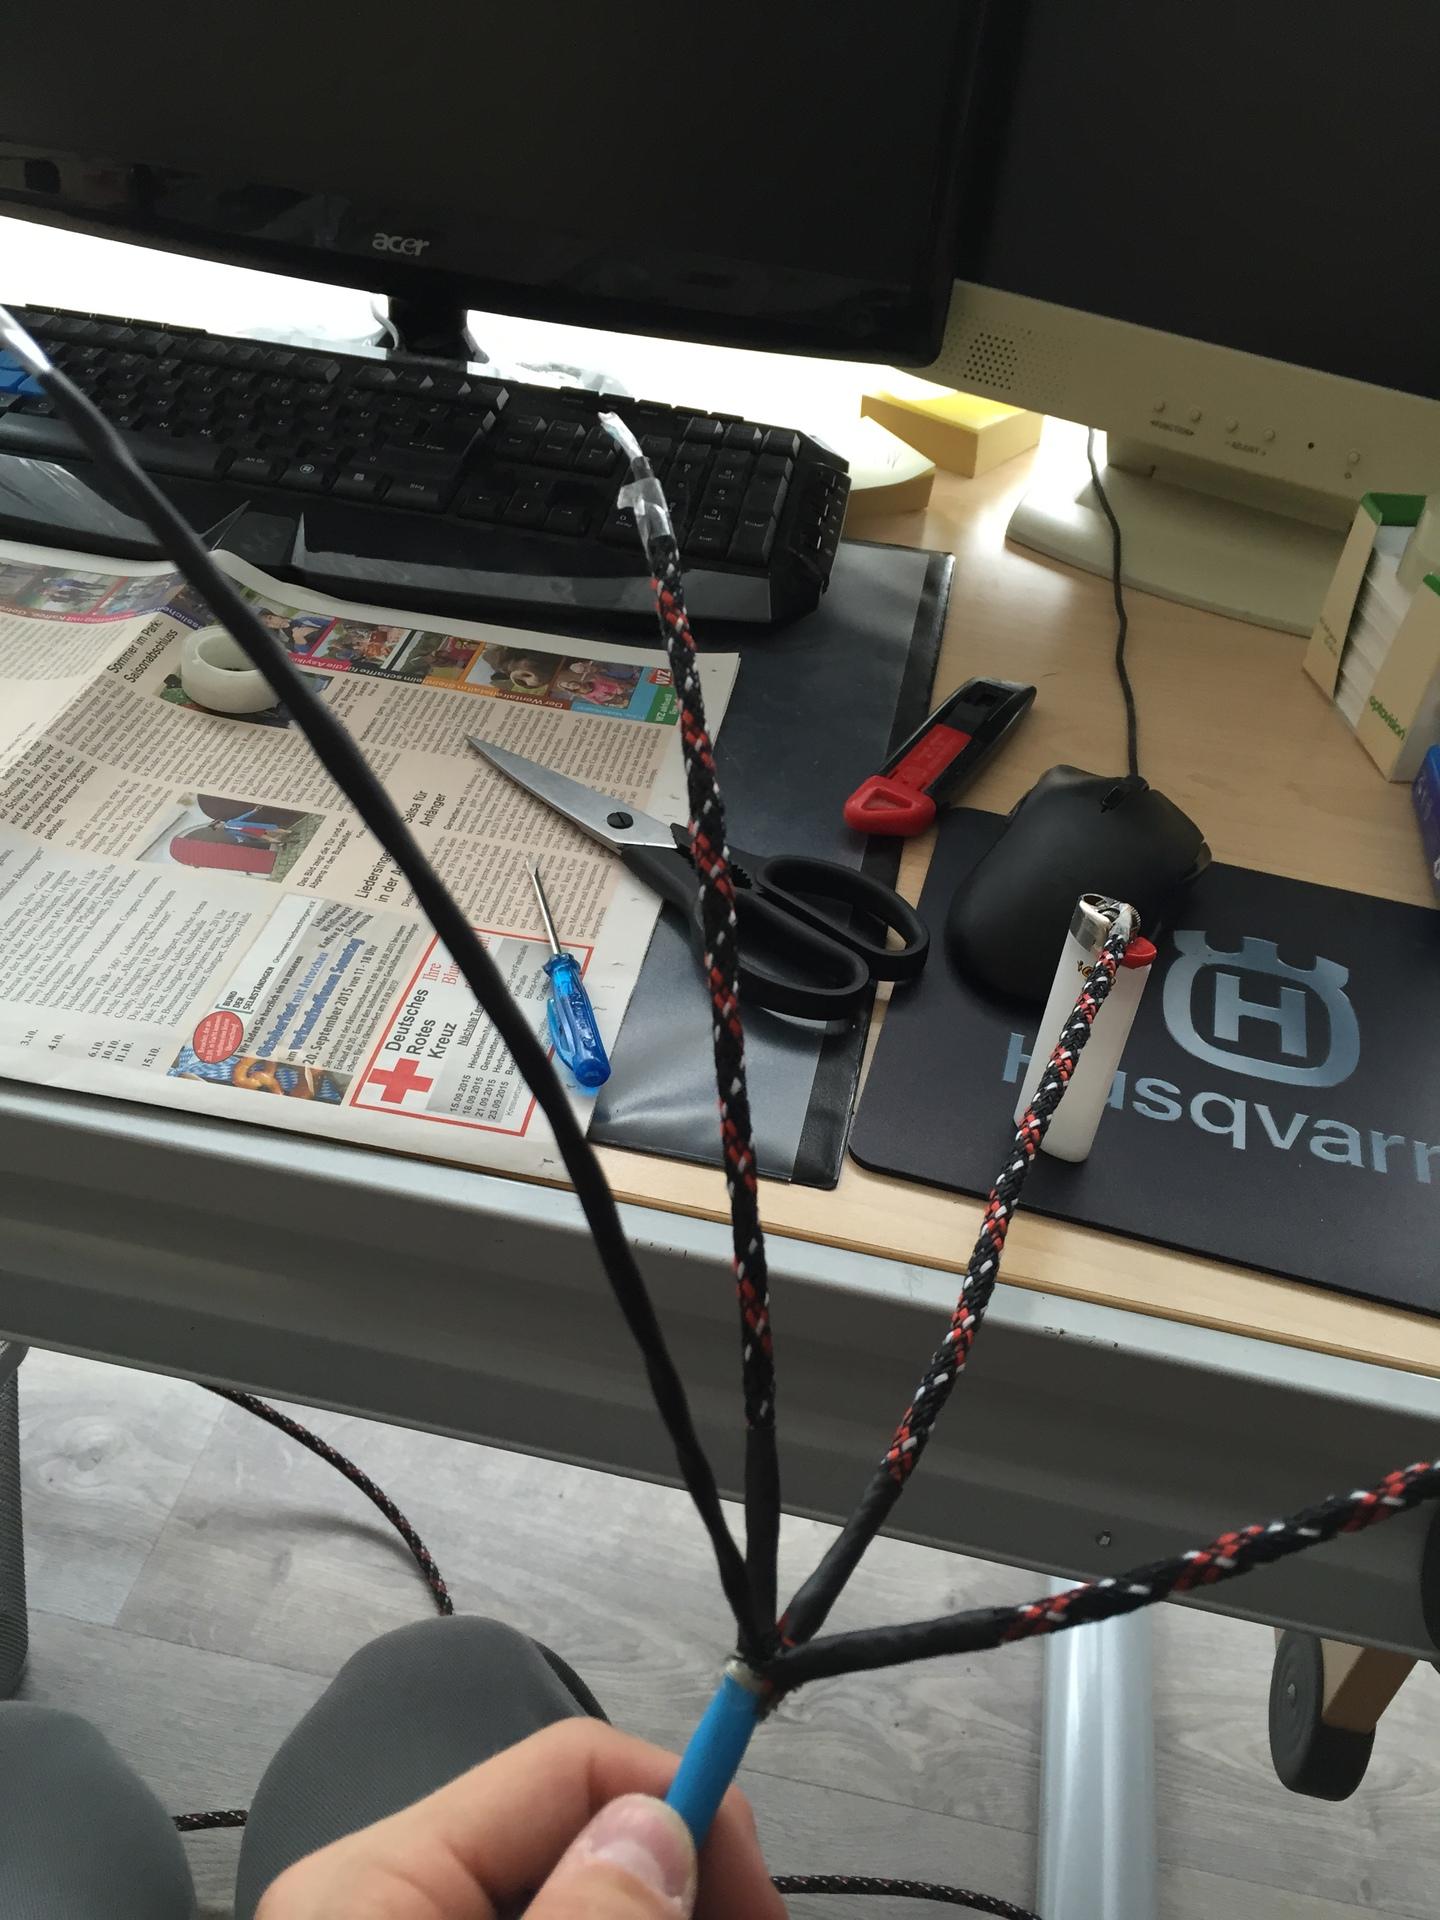 Berühmt Lautsprecherkabel Mit Cinch Kabel Bilder - Schaltplan Serie ...